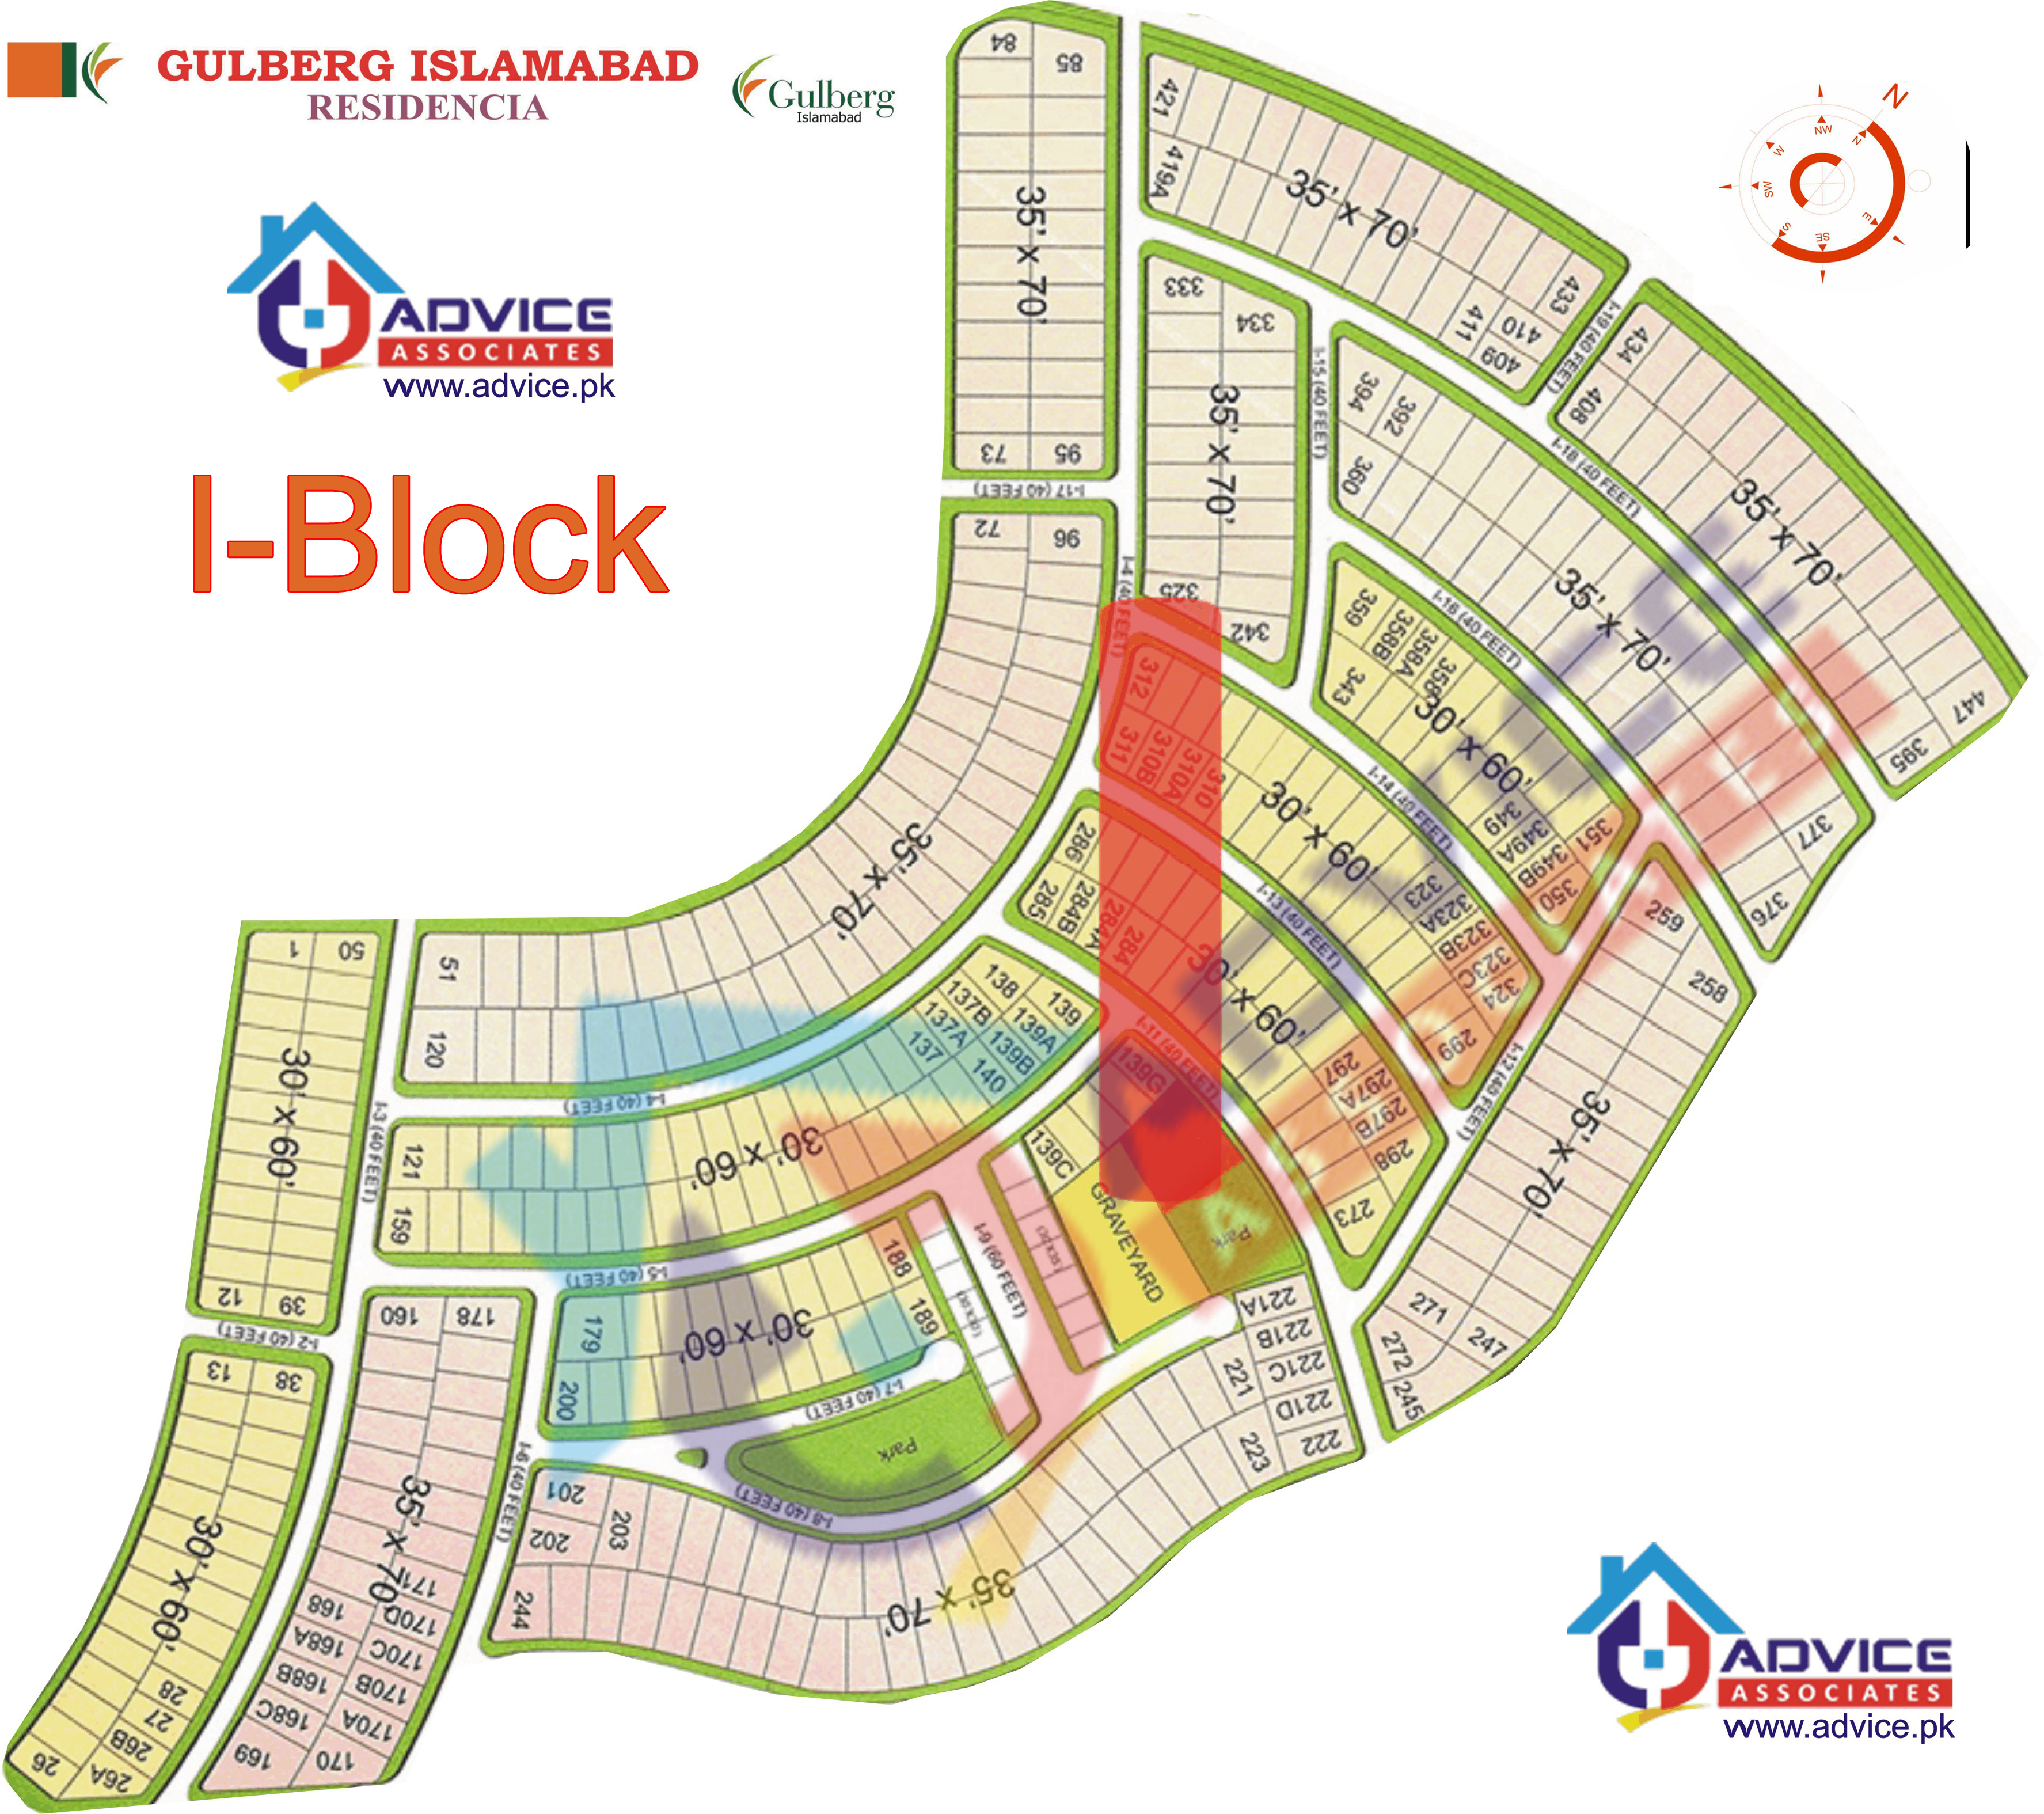 Gulberg Residentia Block I